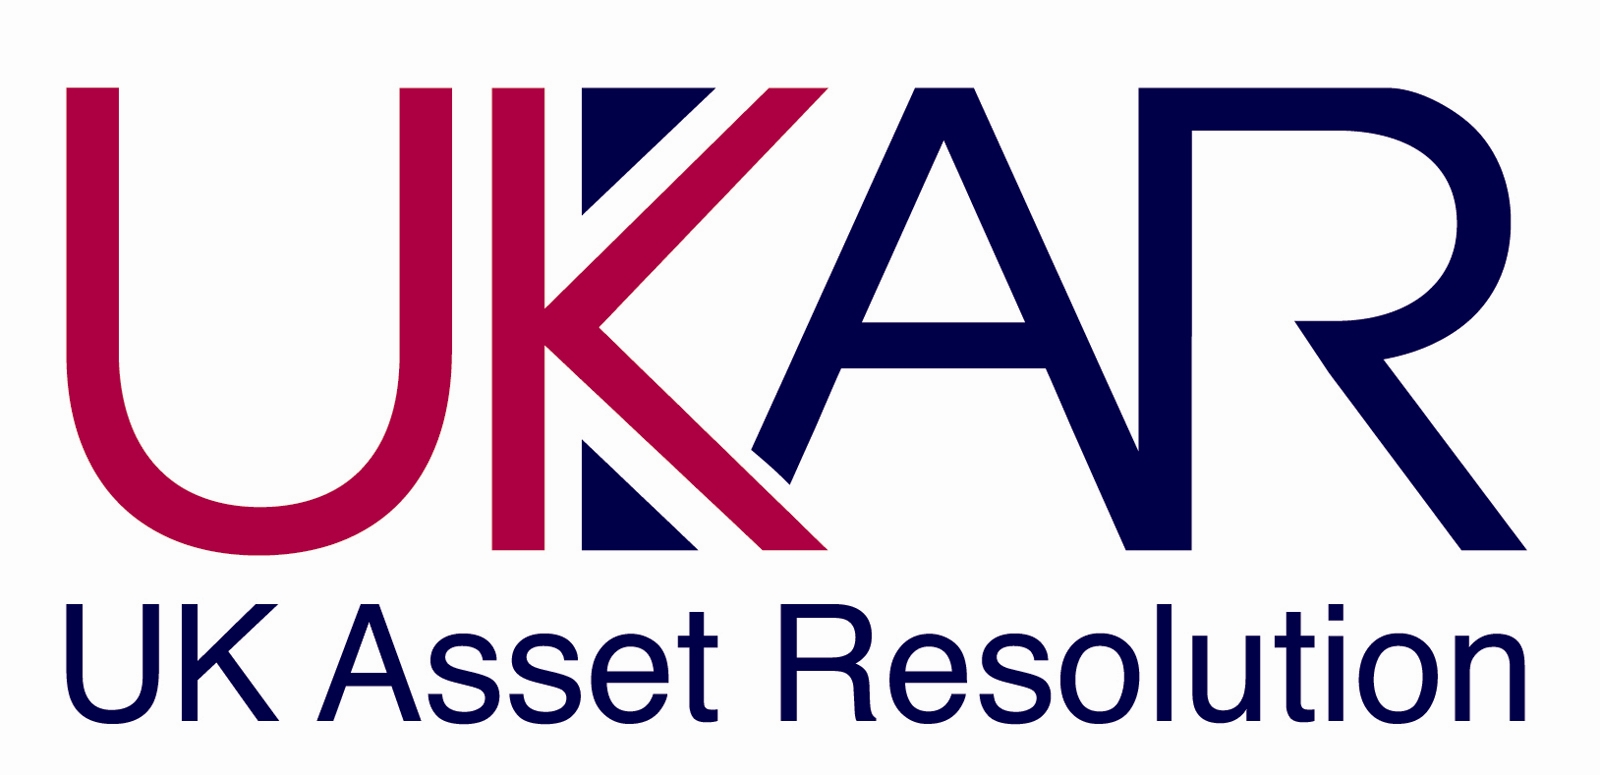 UKAR sells more Bradford & Bingley mortgage assets